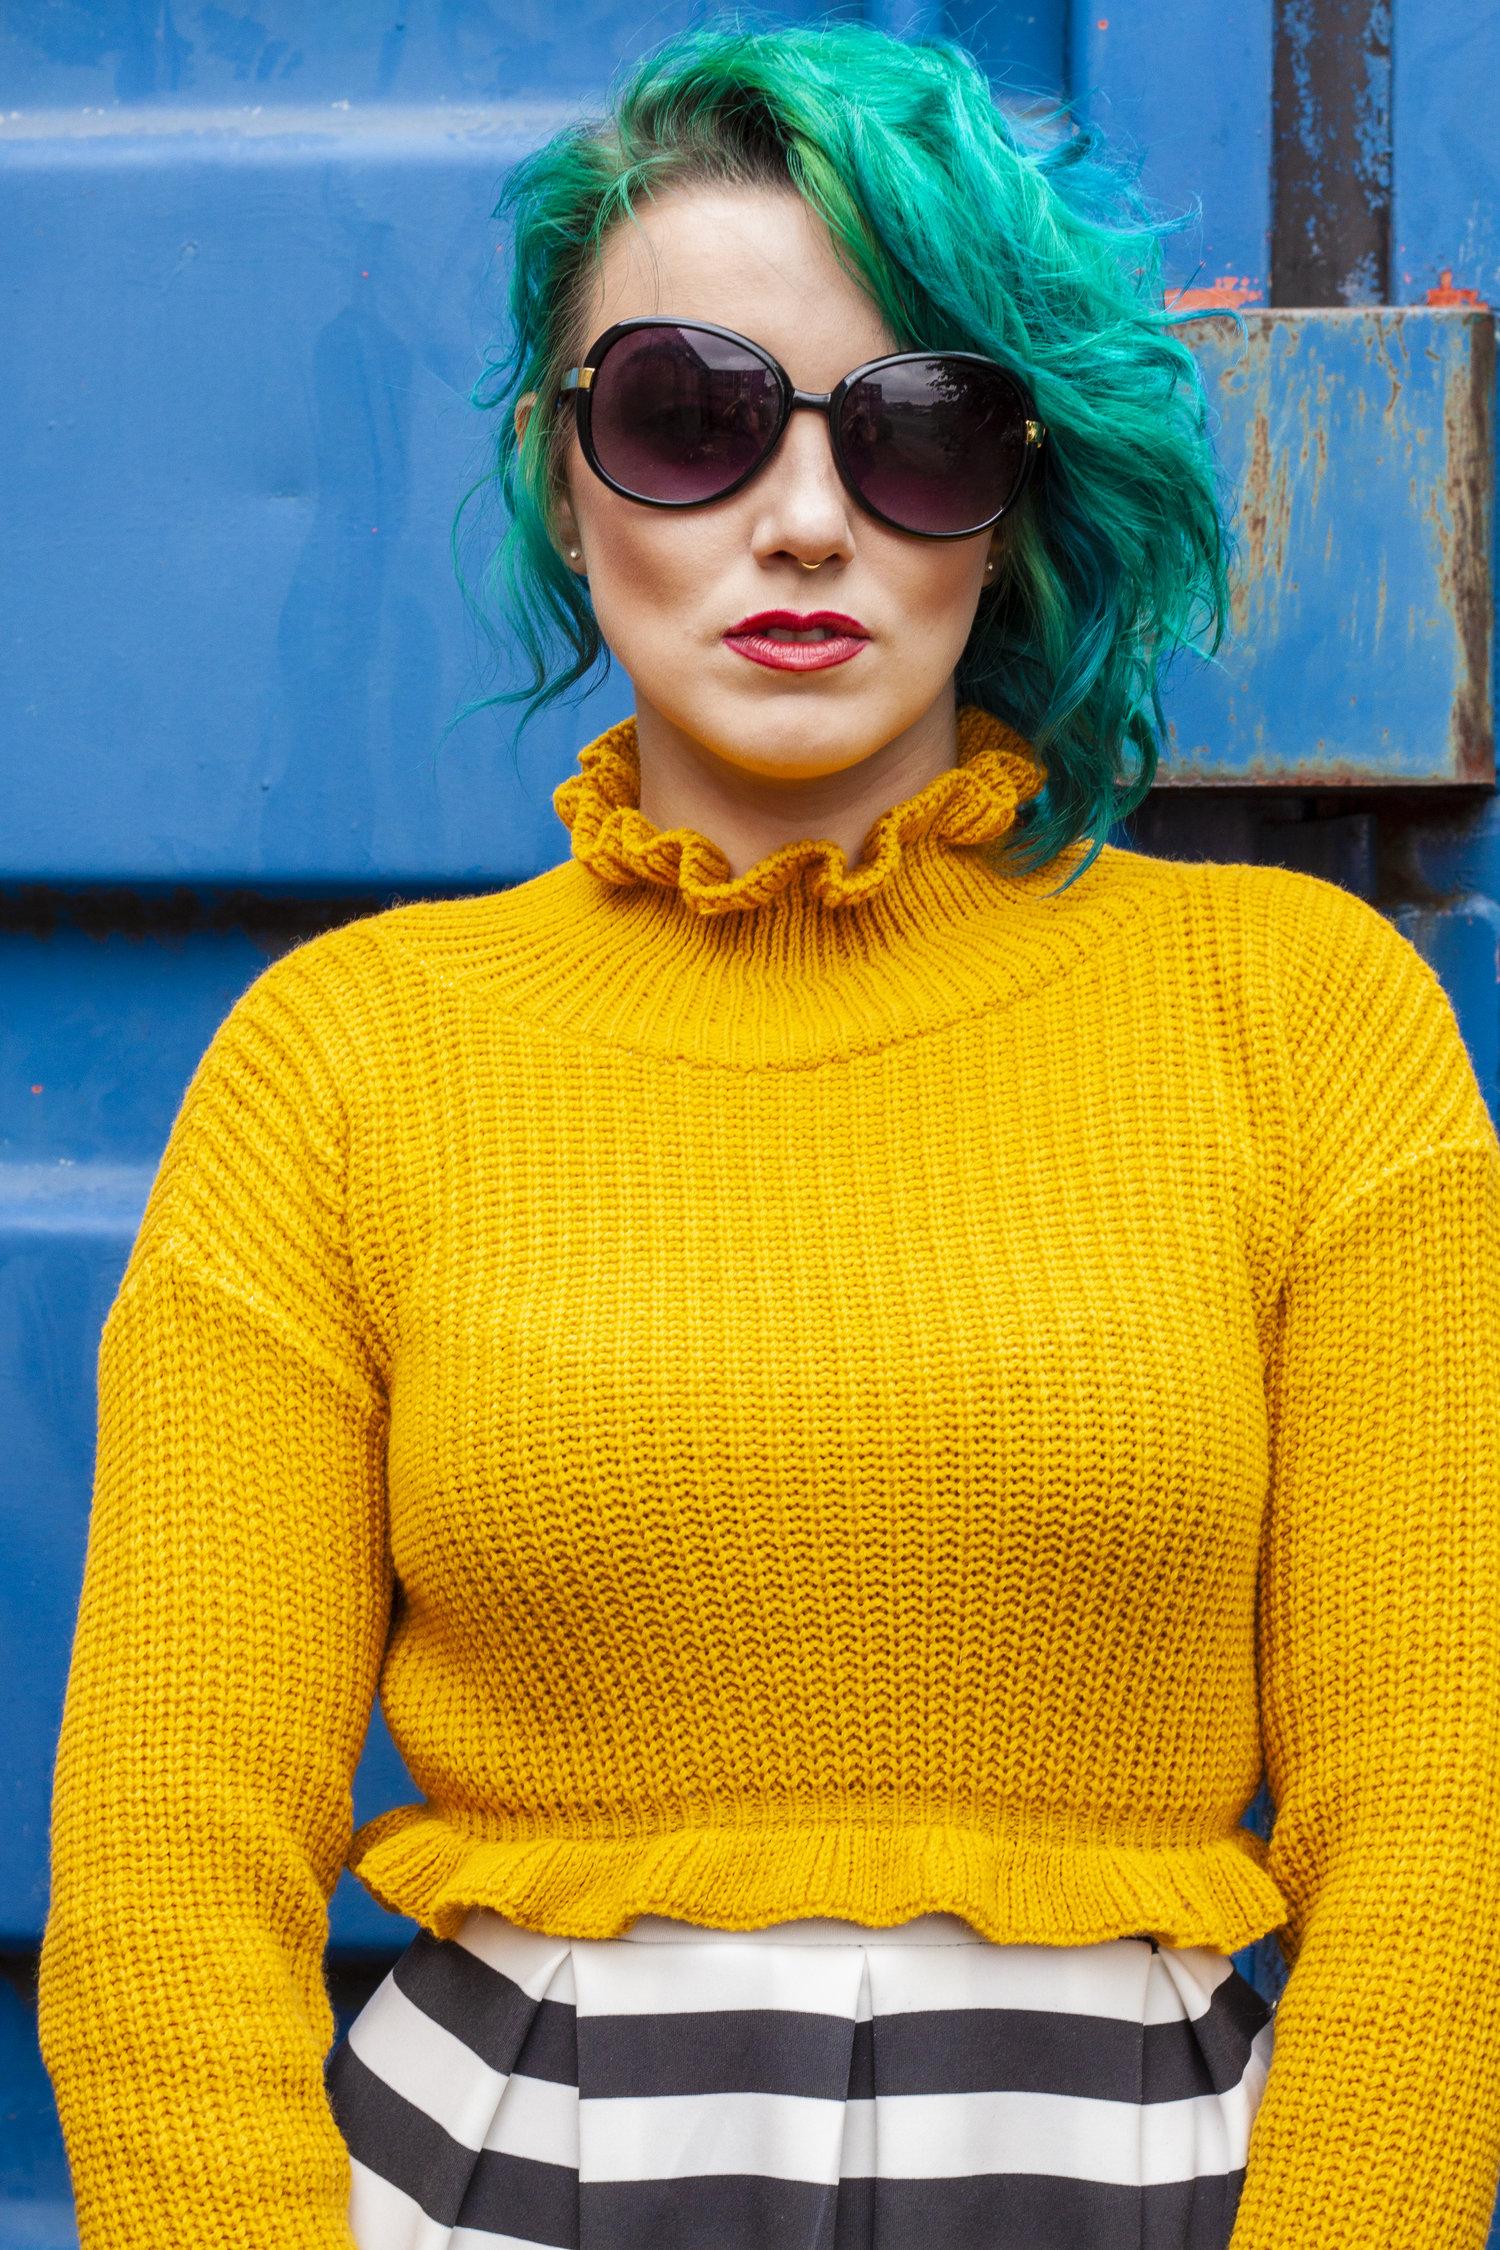 Industrial+Colour+Jasmin+Chadwick+Photography-47.jpg